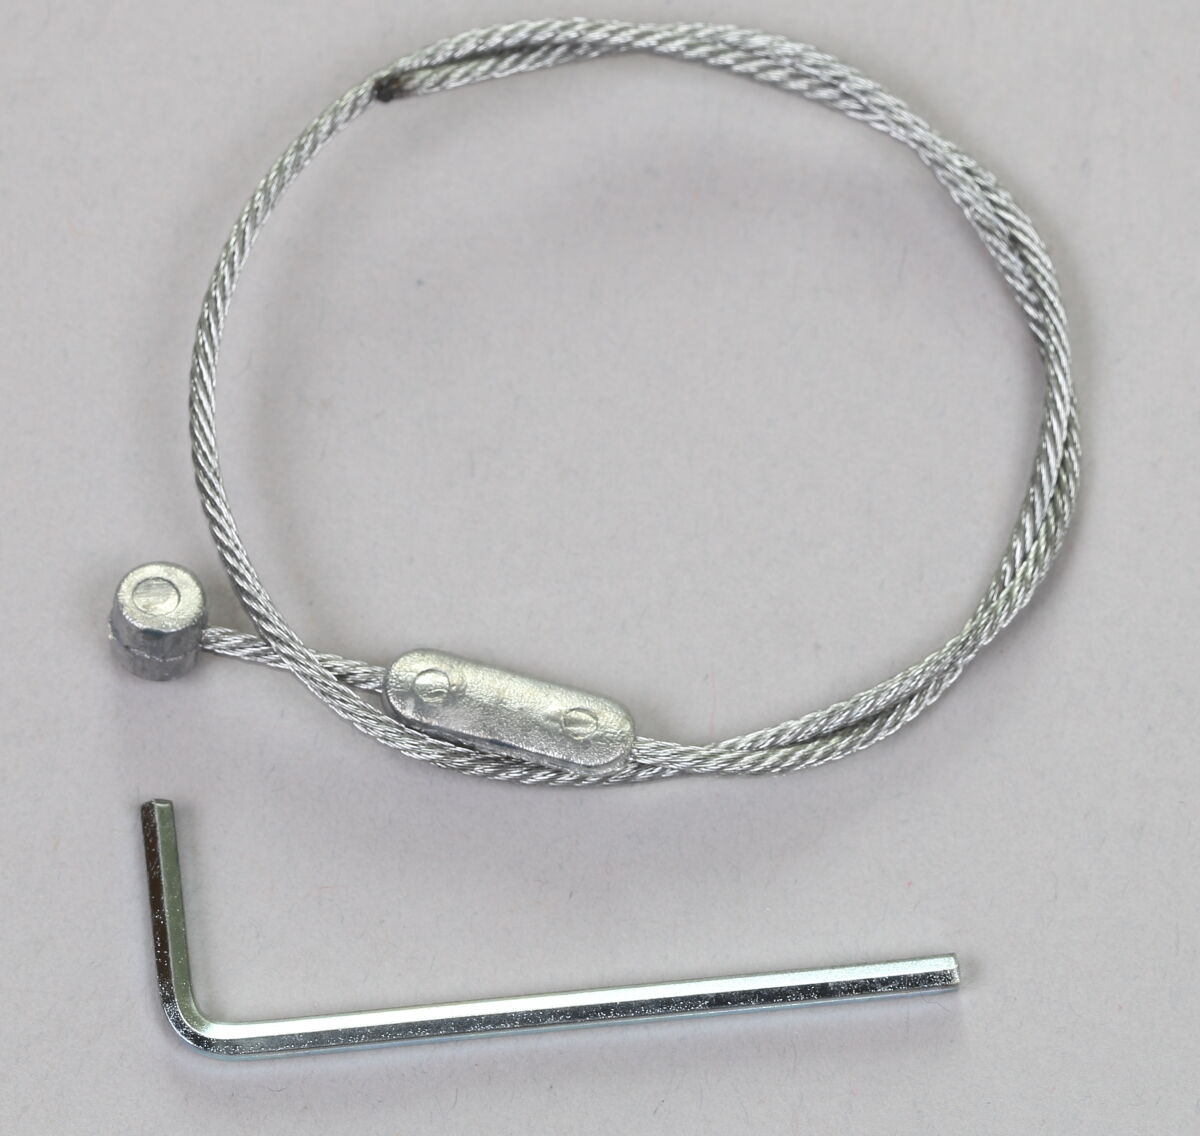 1 TEKTRO alu-kabelhänger pour Cantilever frein avec câble câble avec de connexion f81628